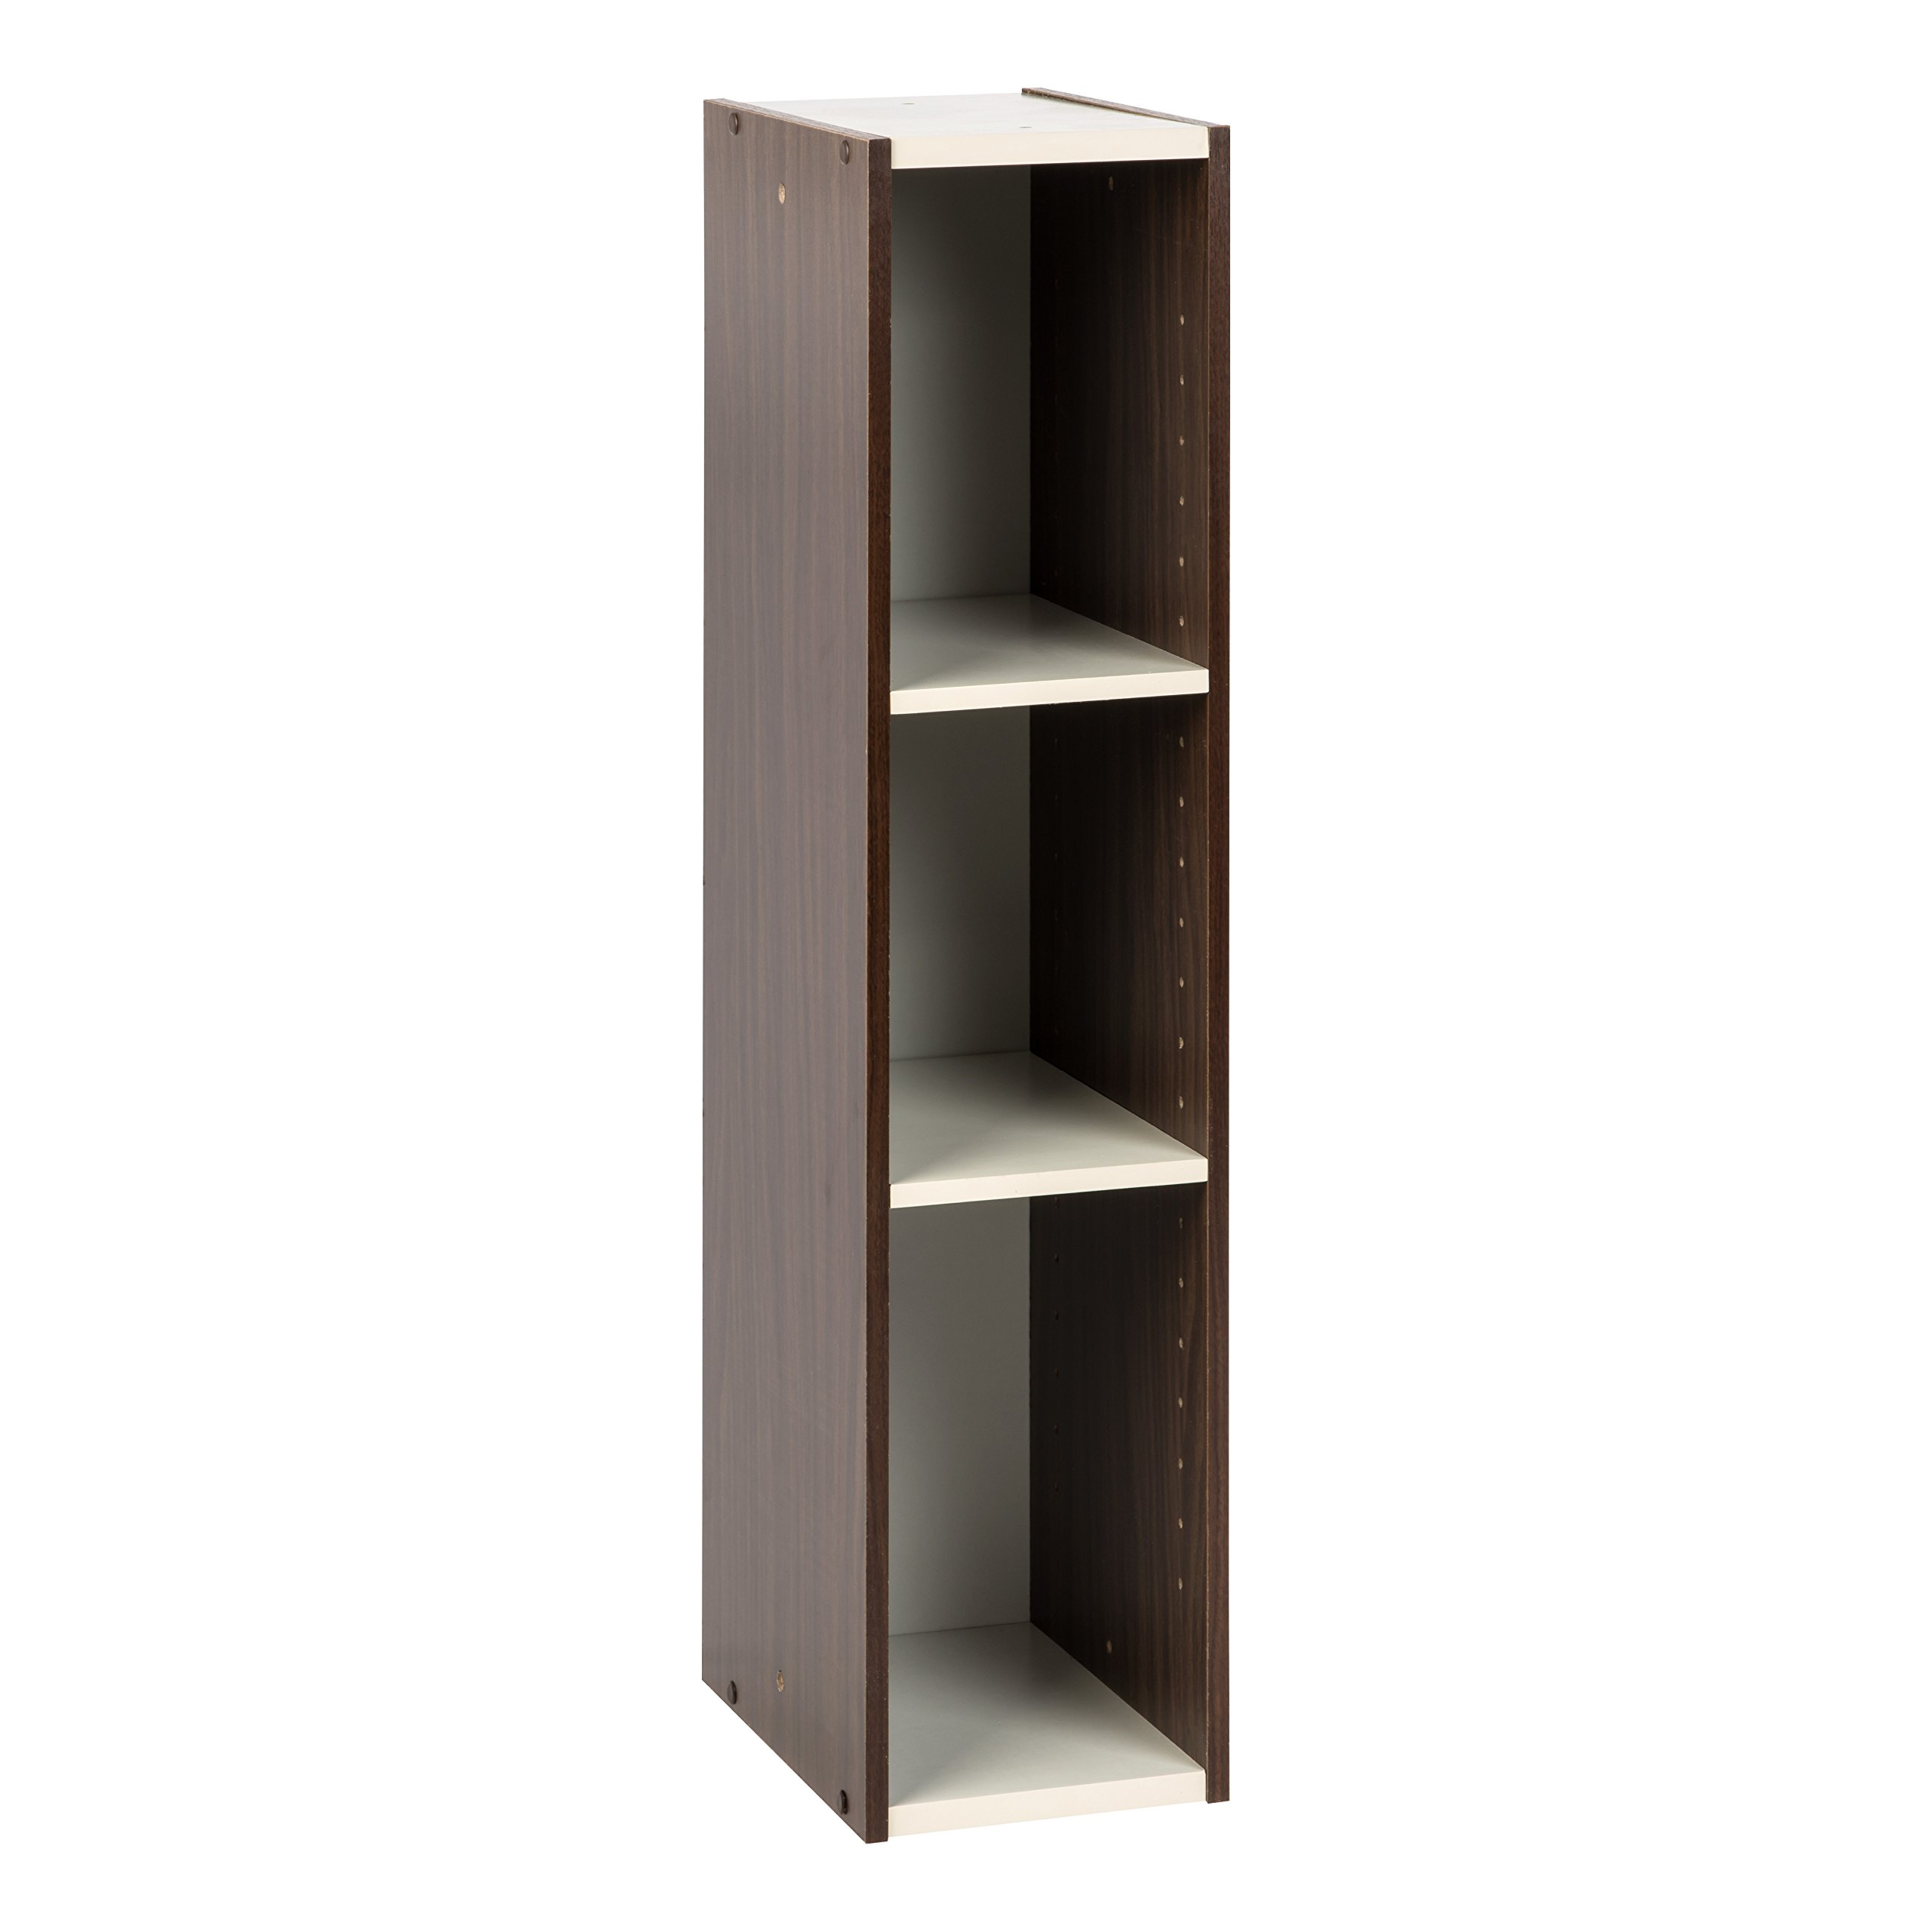 IRIS USA, UB-9020, Slim Space Saving Shelf with Adjustable Shelves, 8 x 34'', Walnut Brown, 1 Pack